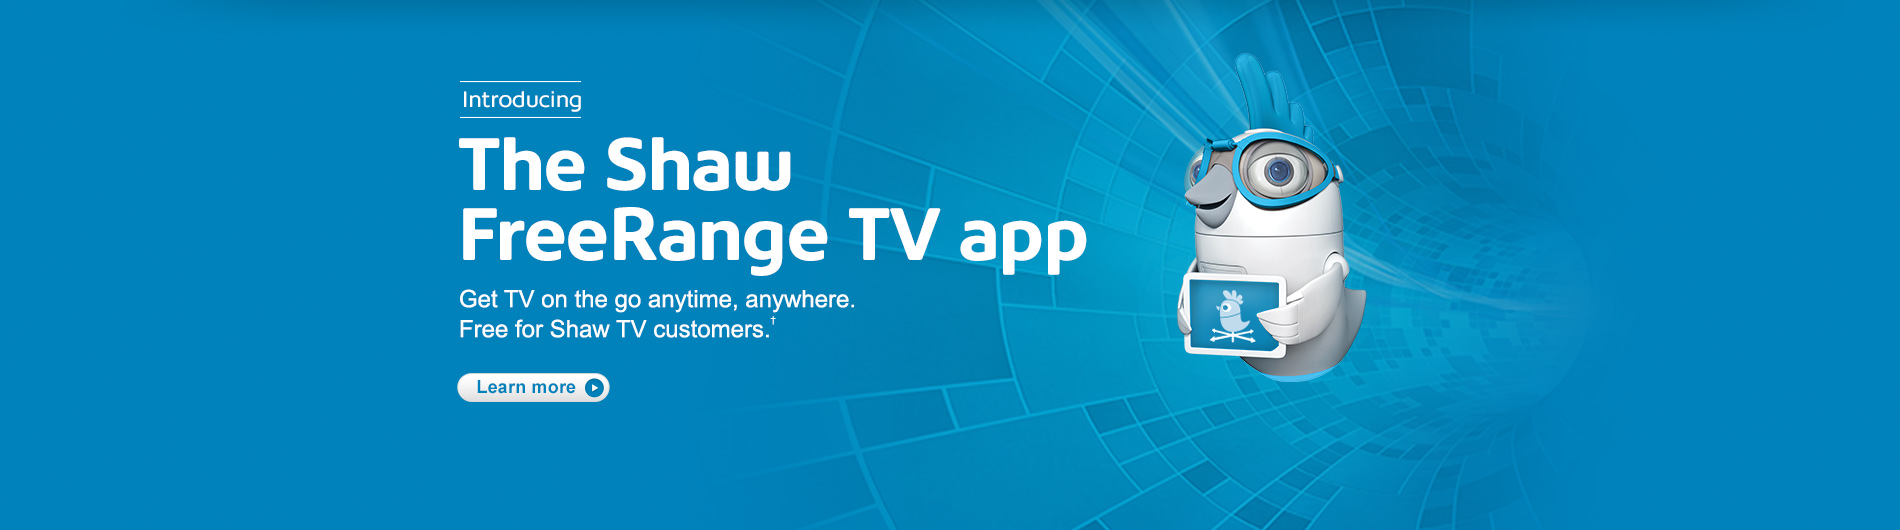 FreeRange TV